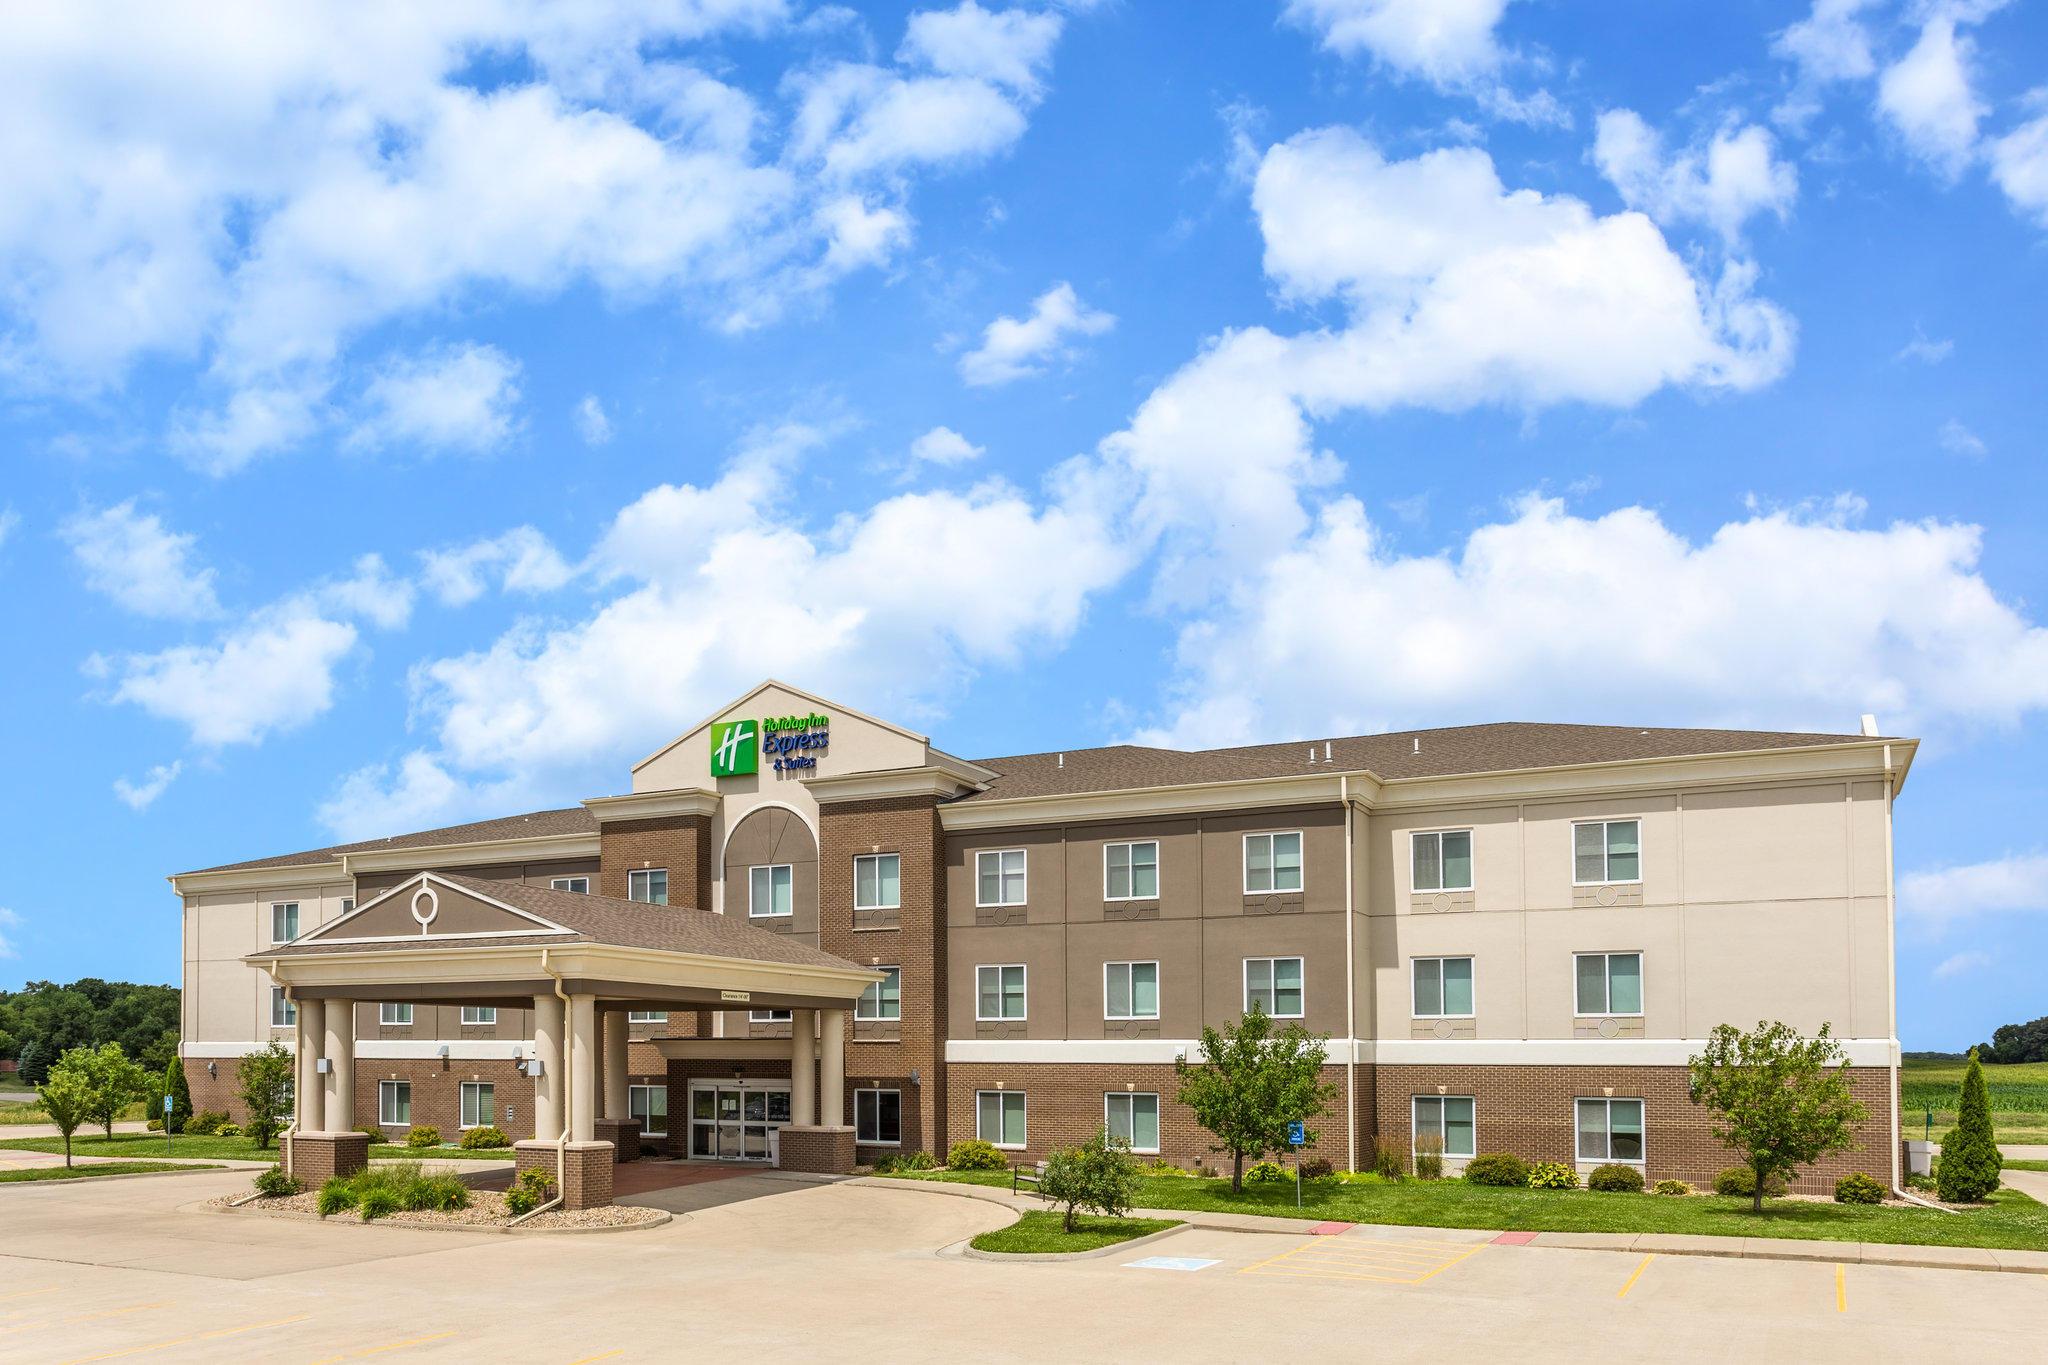 Holiday Inn Express & Suites Albert Lea - I-35, an IHG Hotel